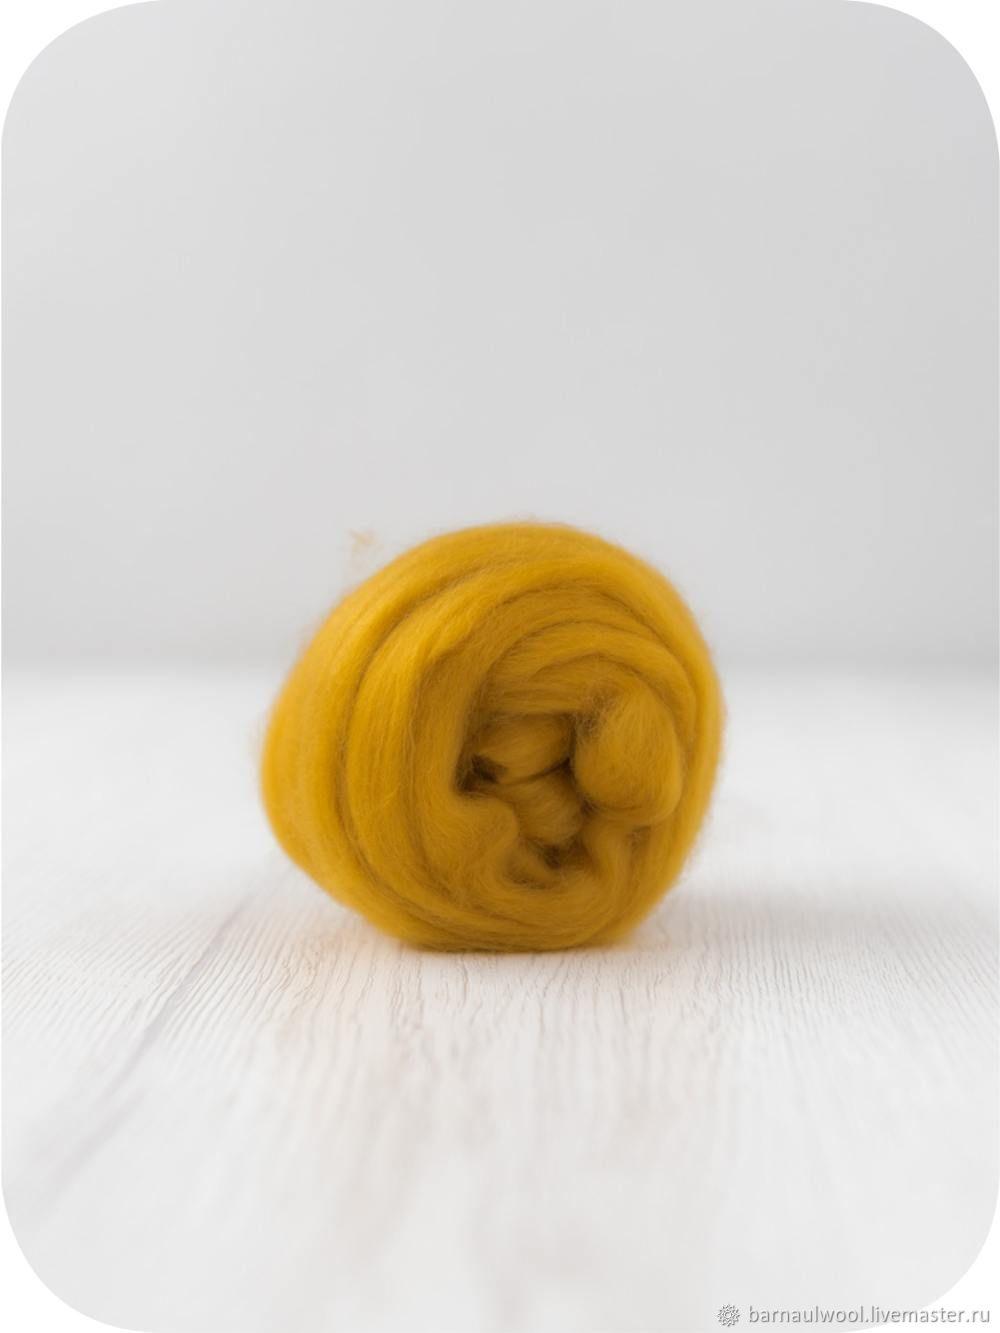 Топс кашемир шафран 10 грамм Италия, Валяние, Барнаул, Фото №1